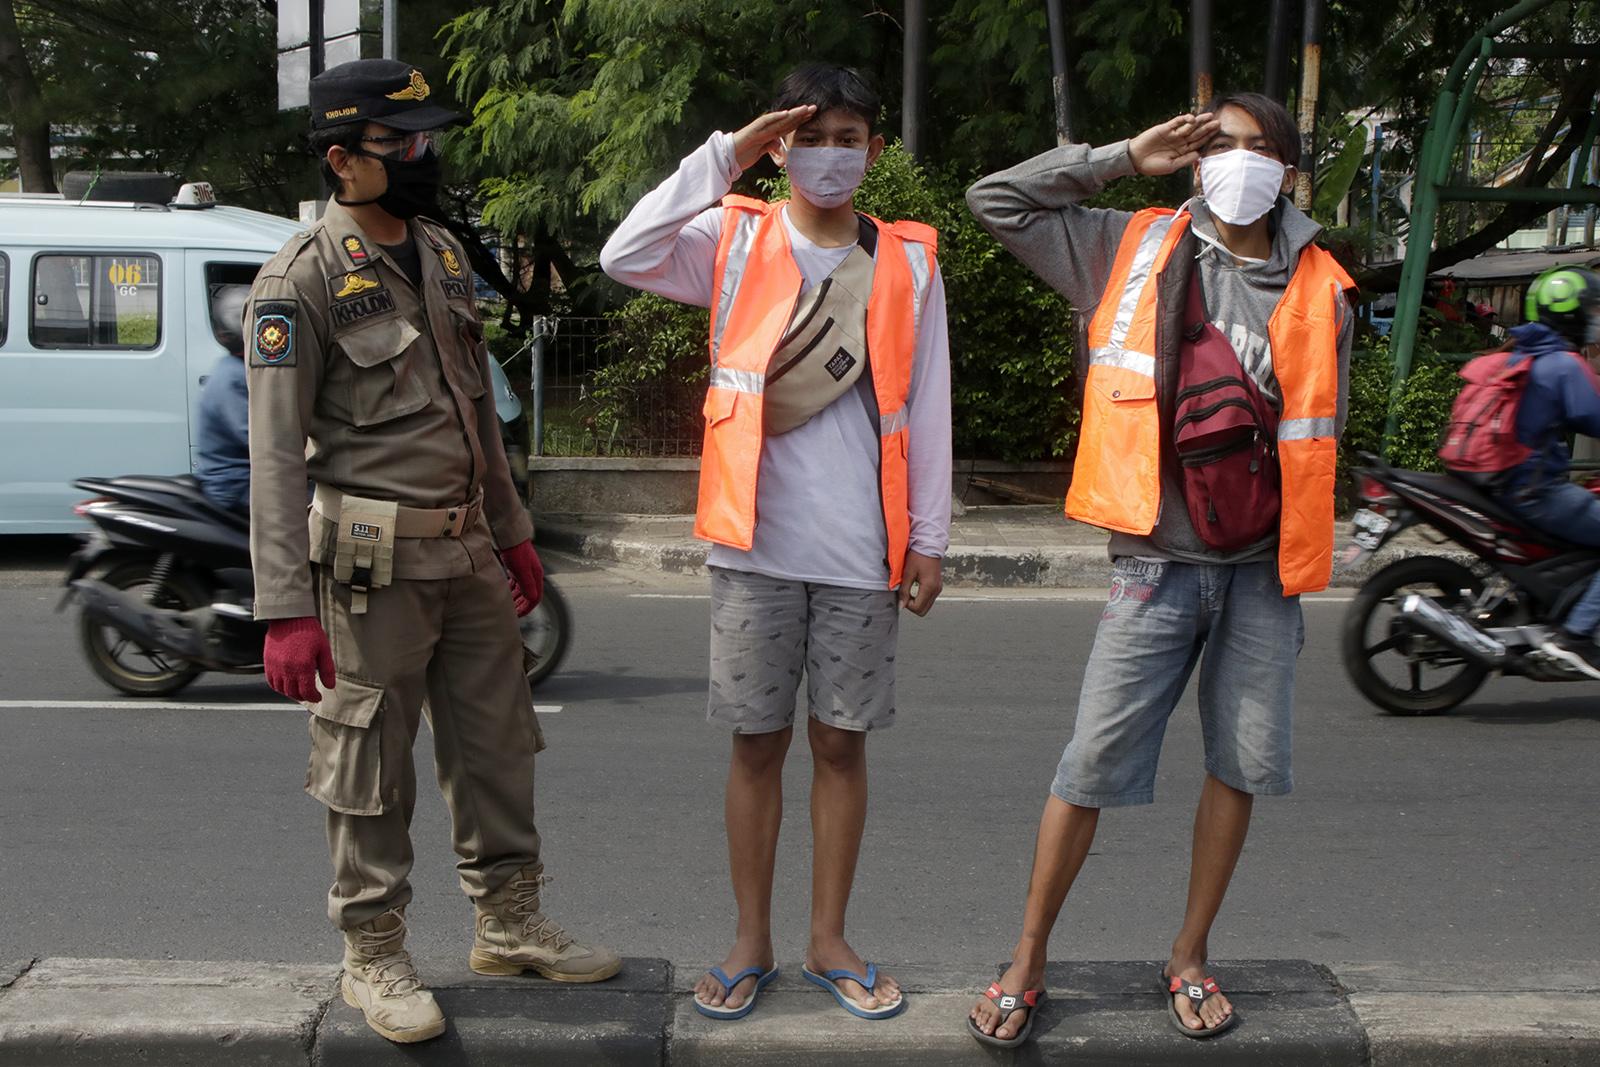 Soal Warga DKI Jakarta Cari Hiburan di Daerah Penyangga, Ini Jawaban Kepala Satpol PP